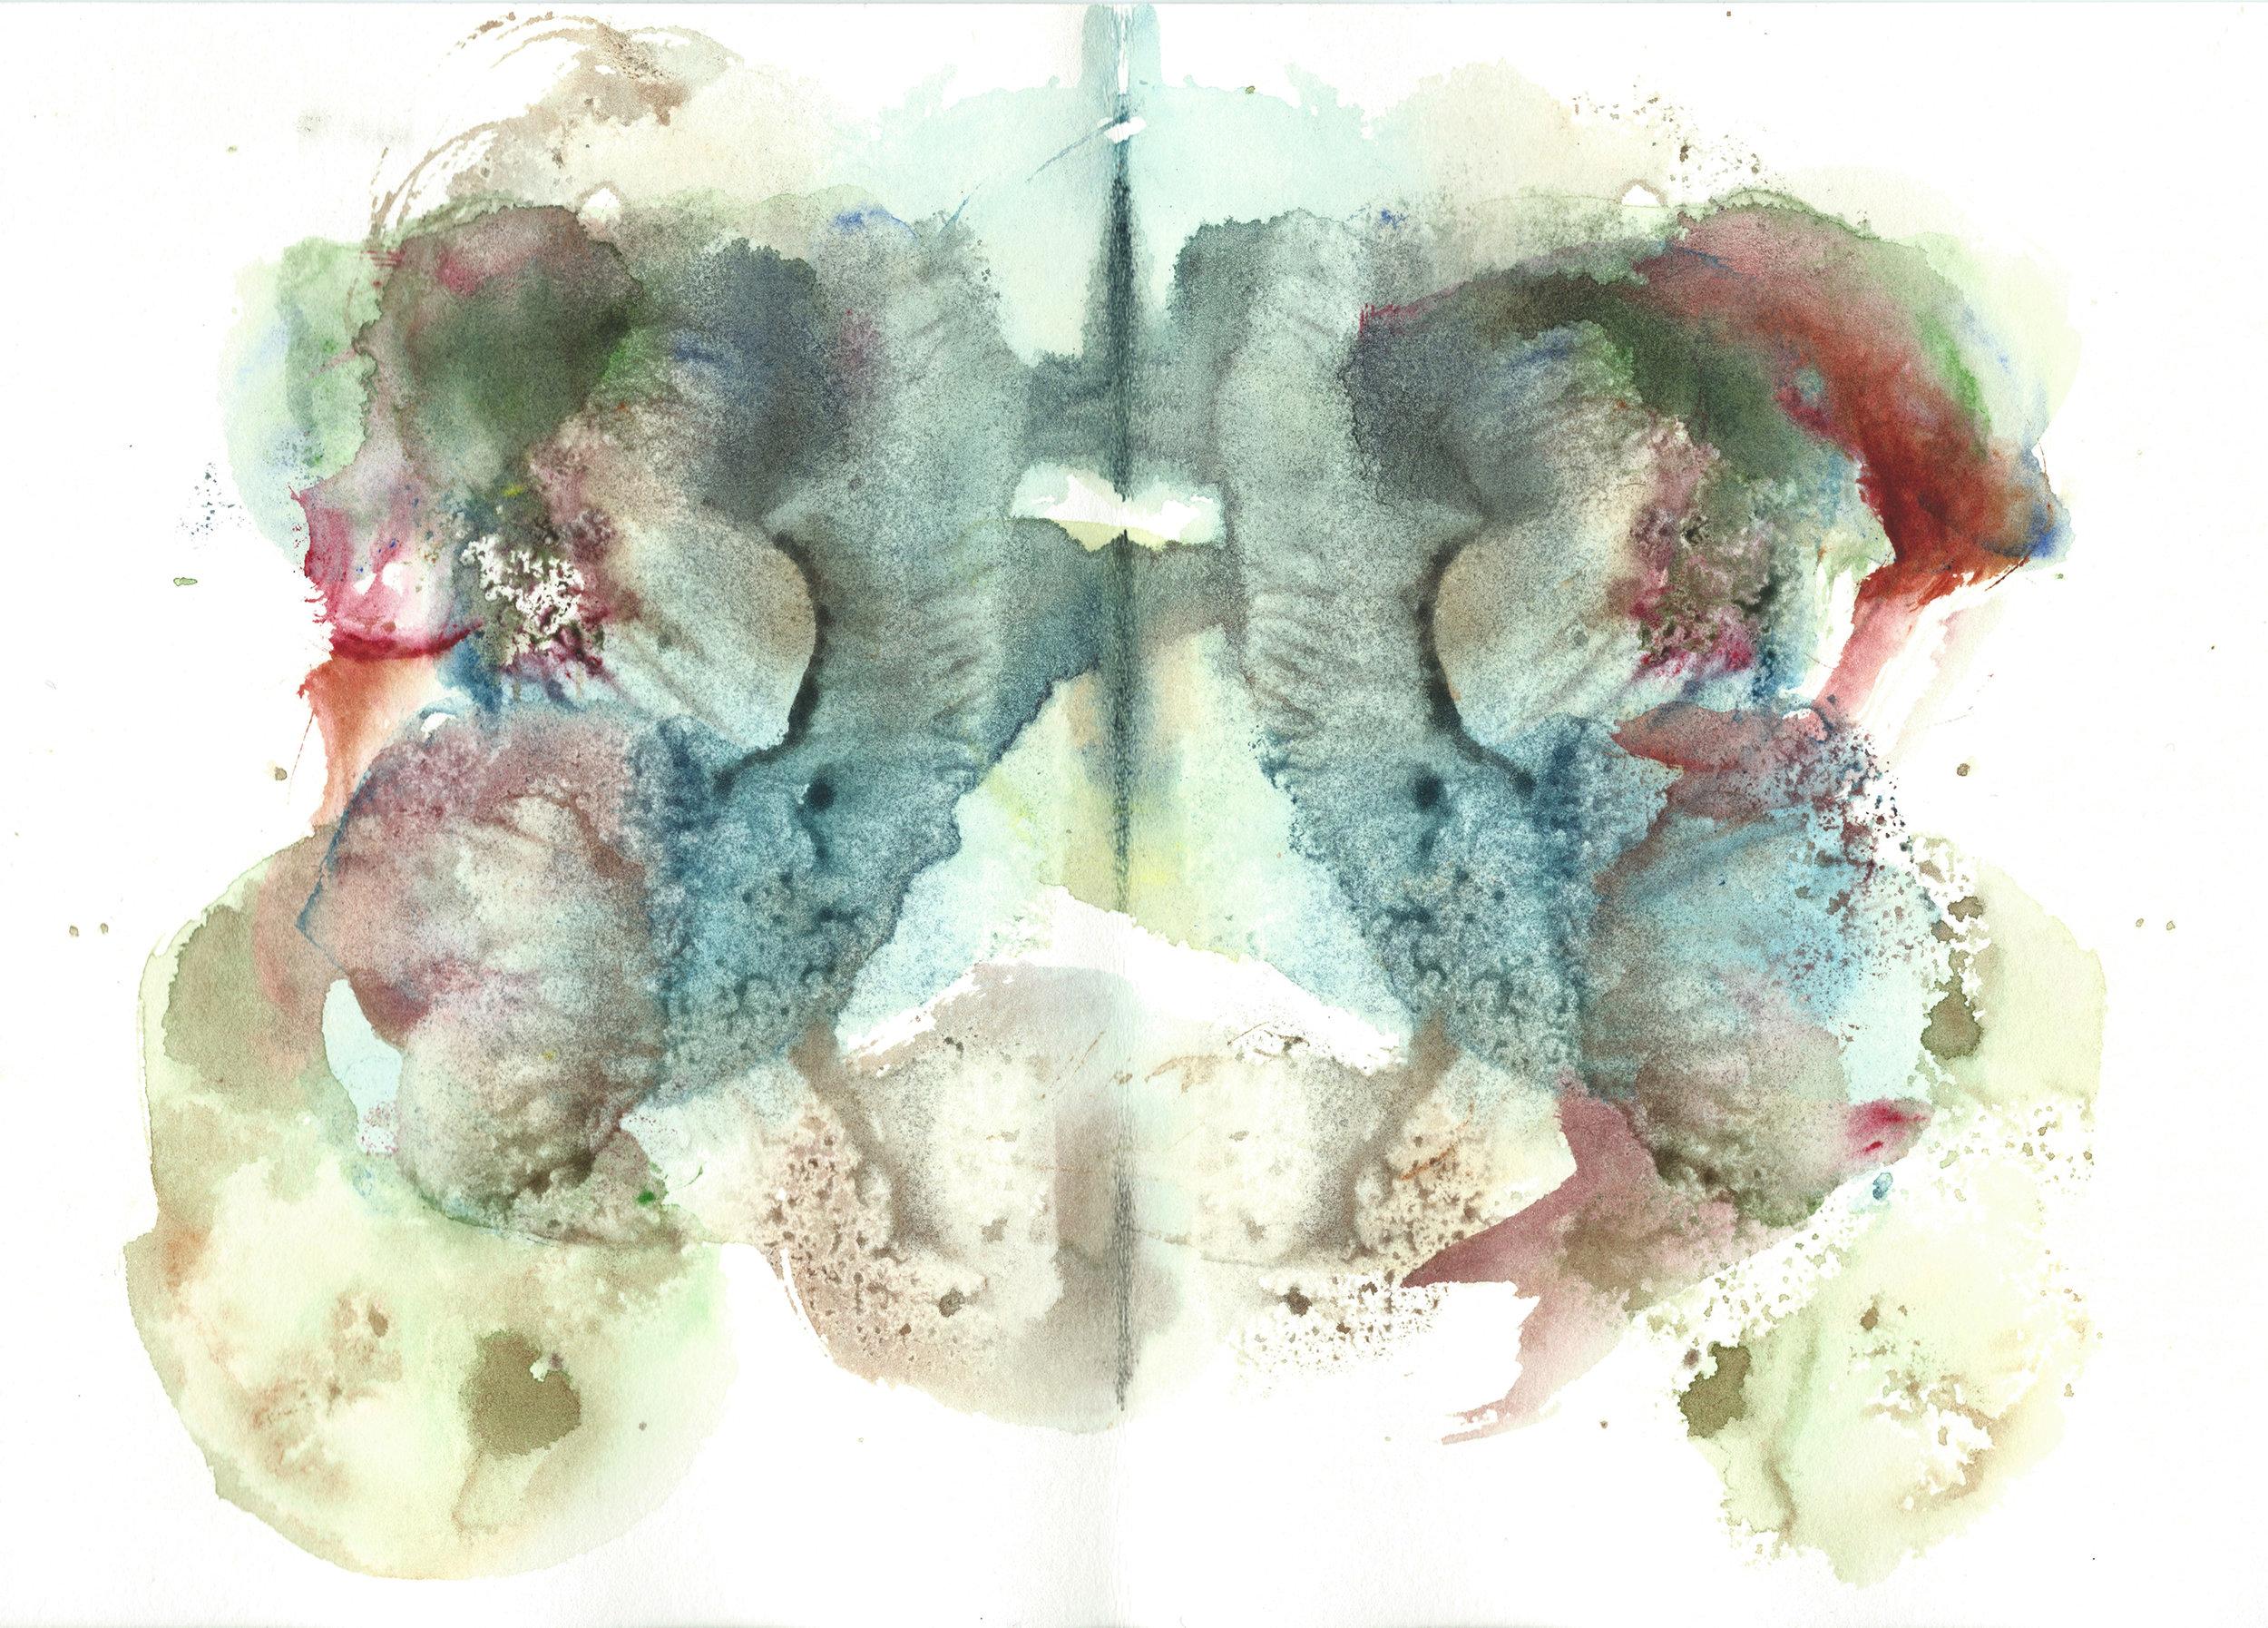 Stephen Thomas, Yoga, Yoga-Svarupa, watercolor 06.jpg